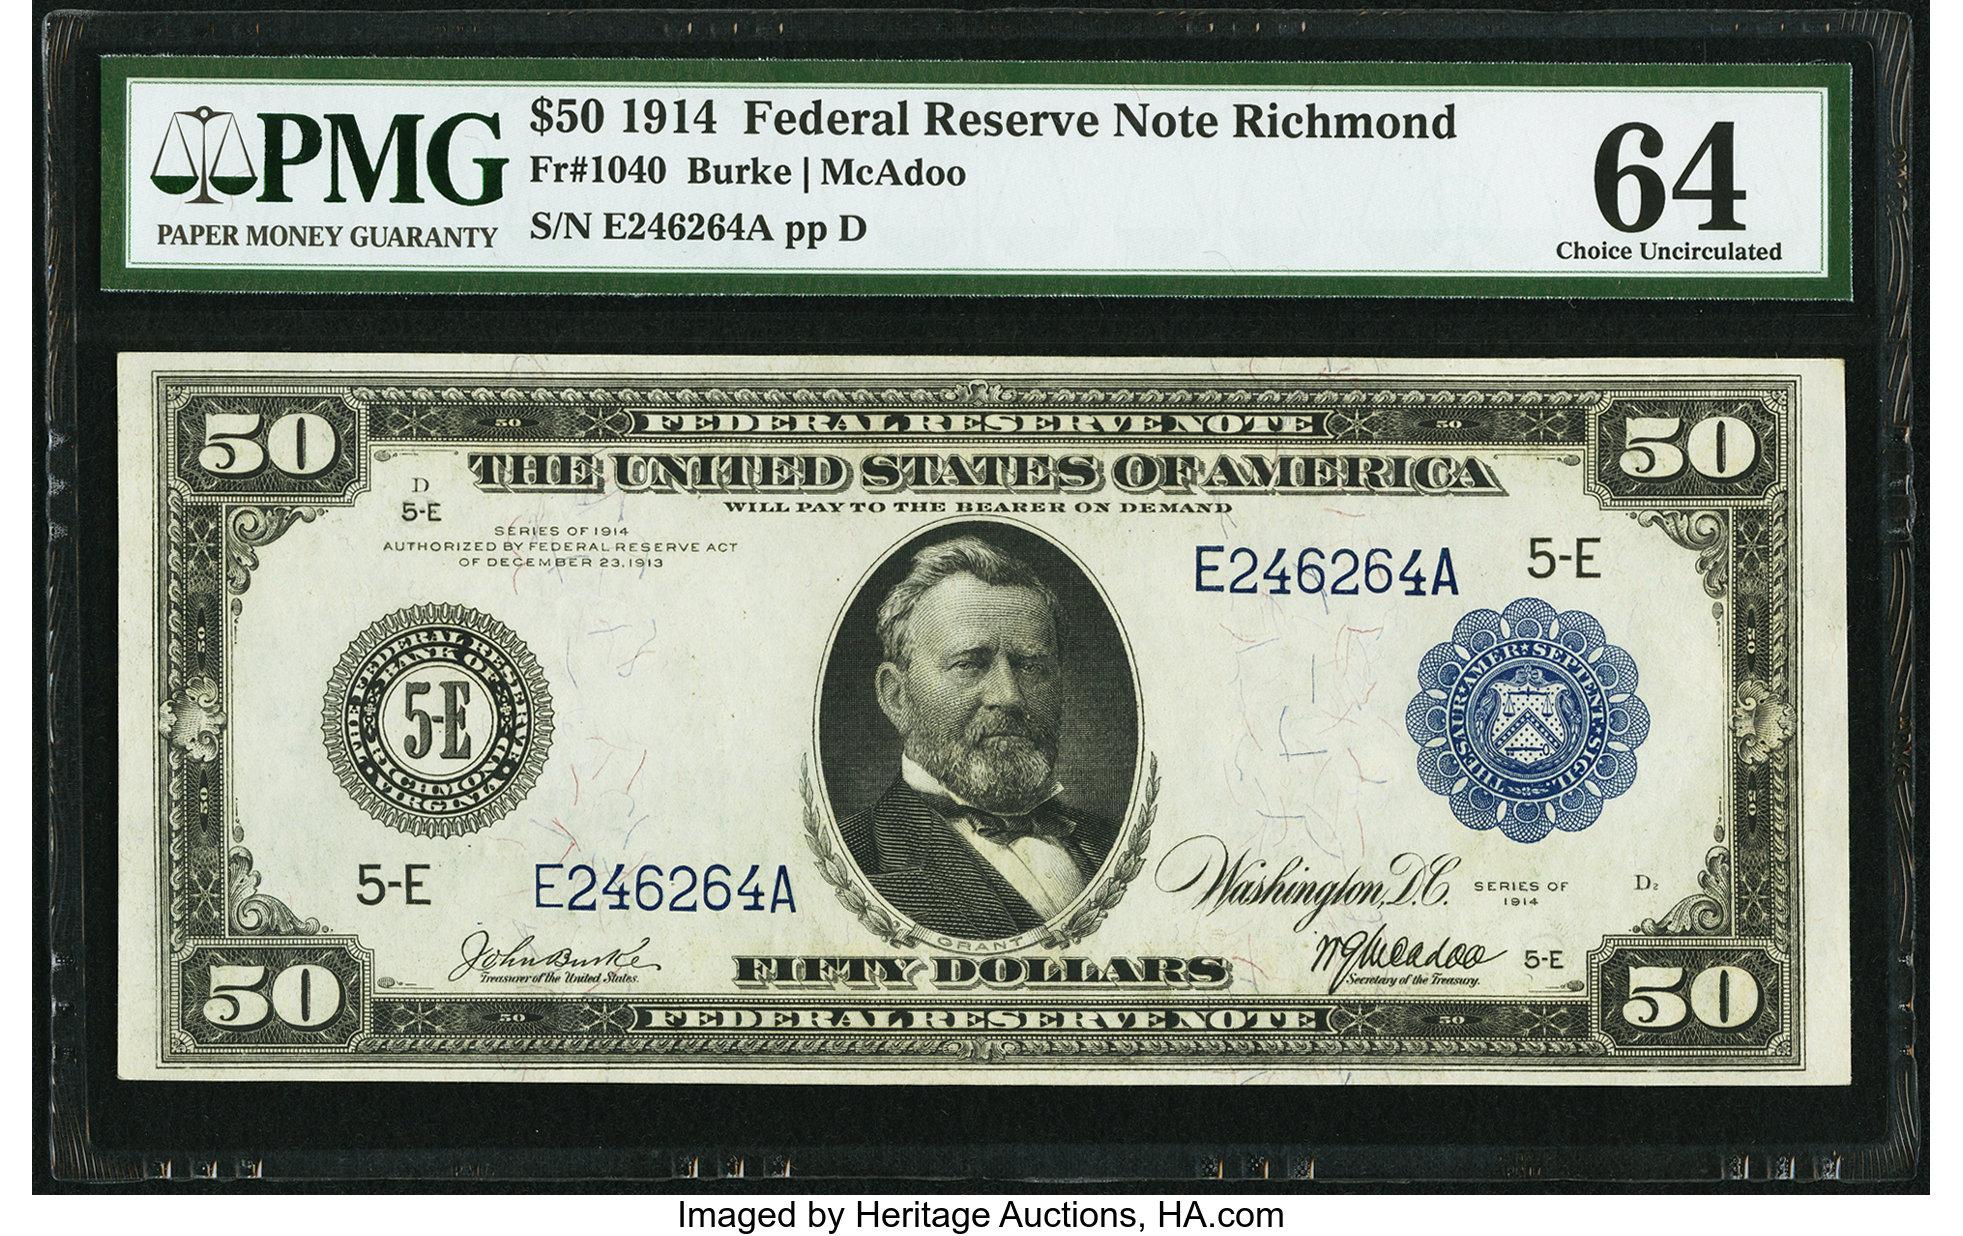 sample image for Fr.1040 $50 Richmond